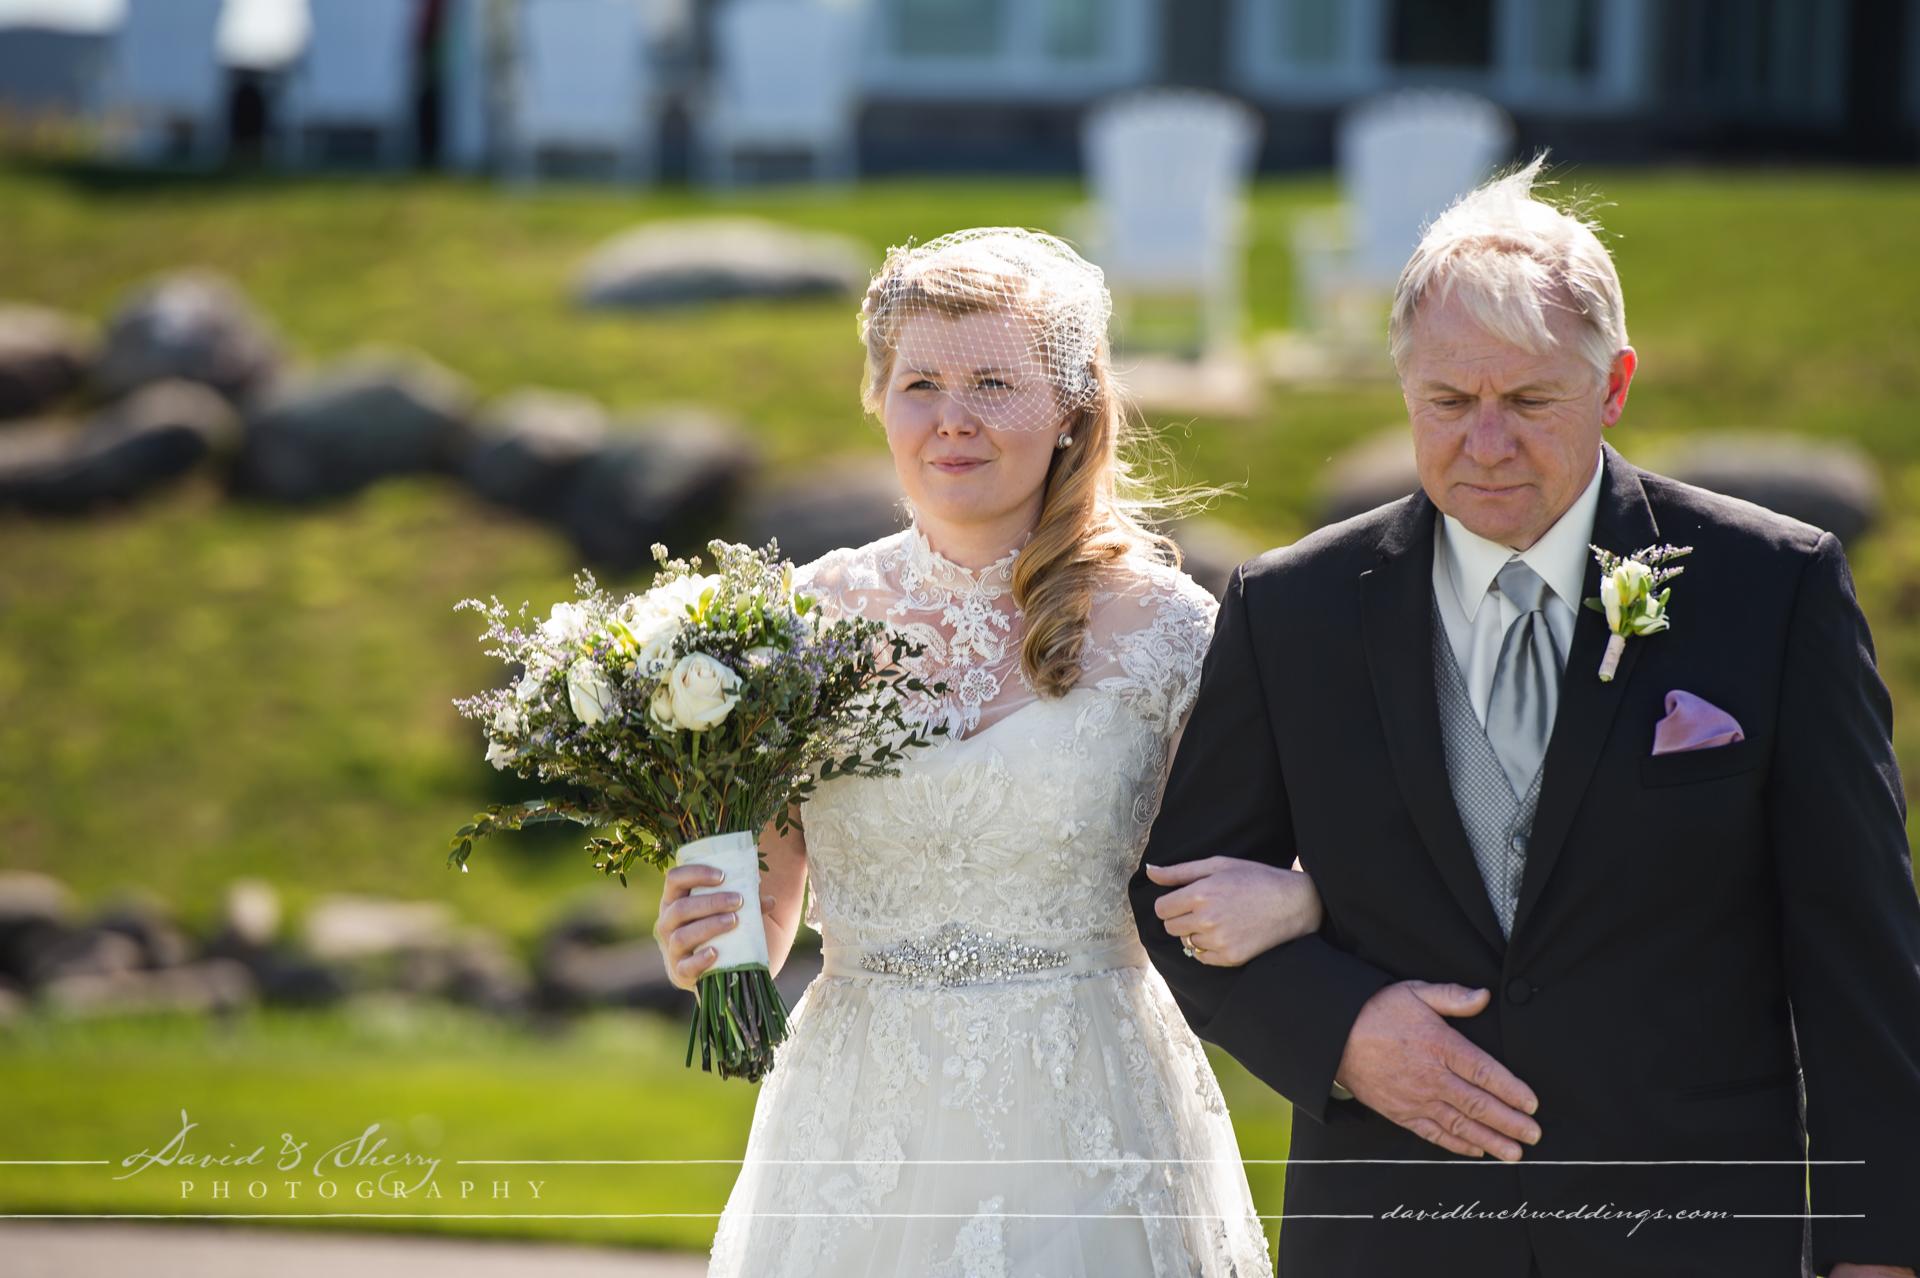 Cobble_Beach_Wedding_Photography_11